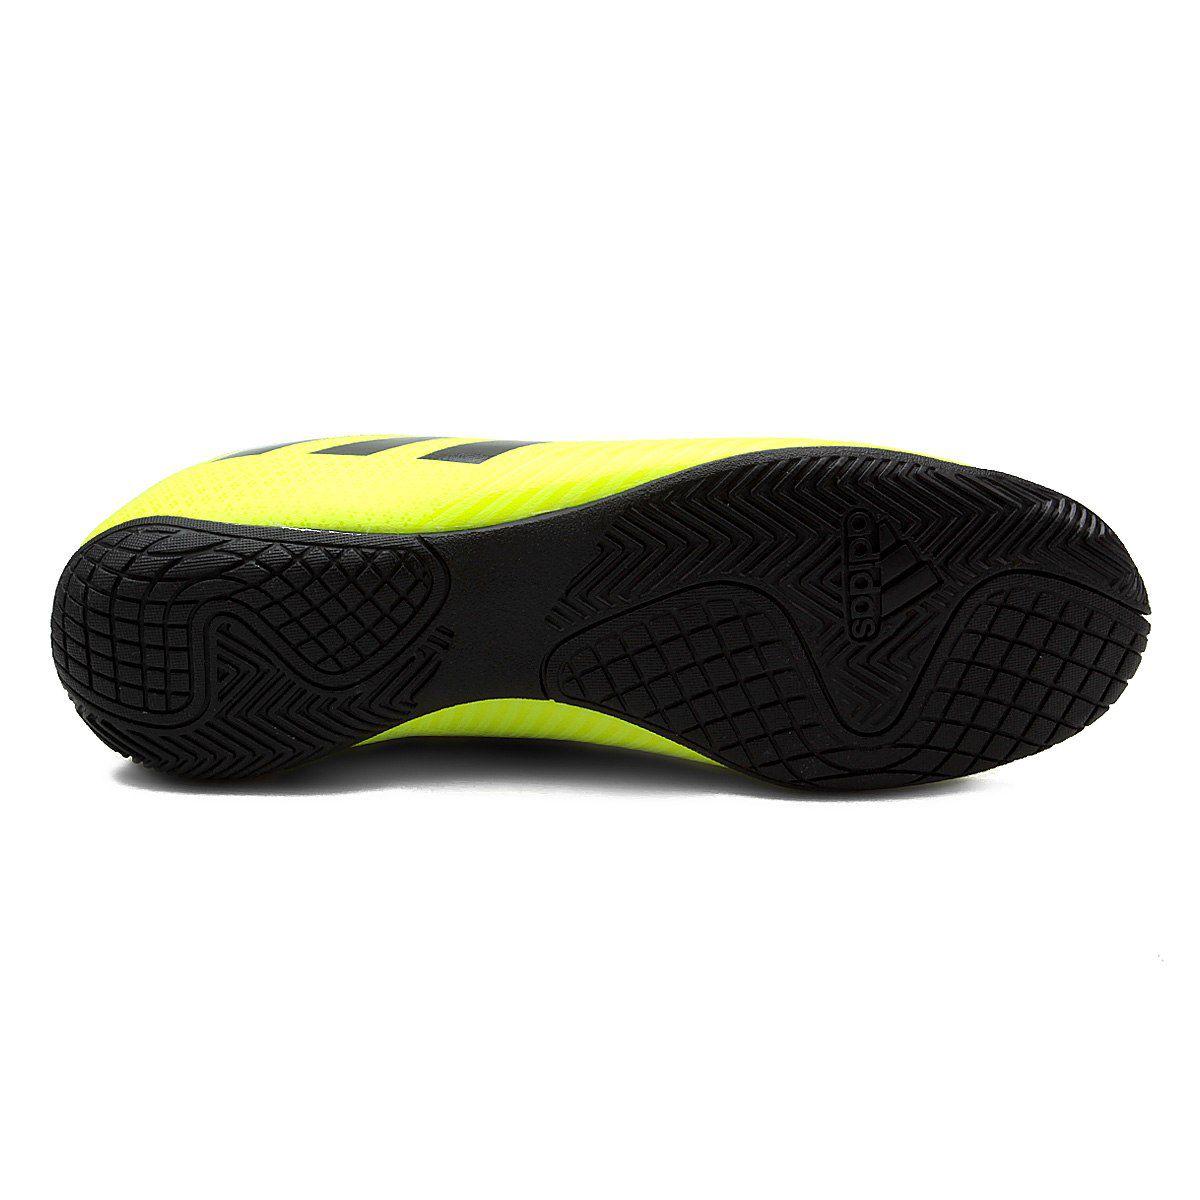 Chuteira Futsal Adidas Artilheira III IN - Amarelo/Preto